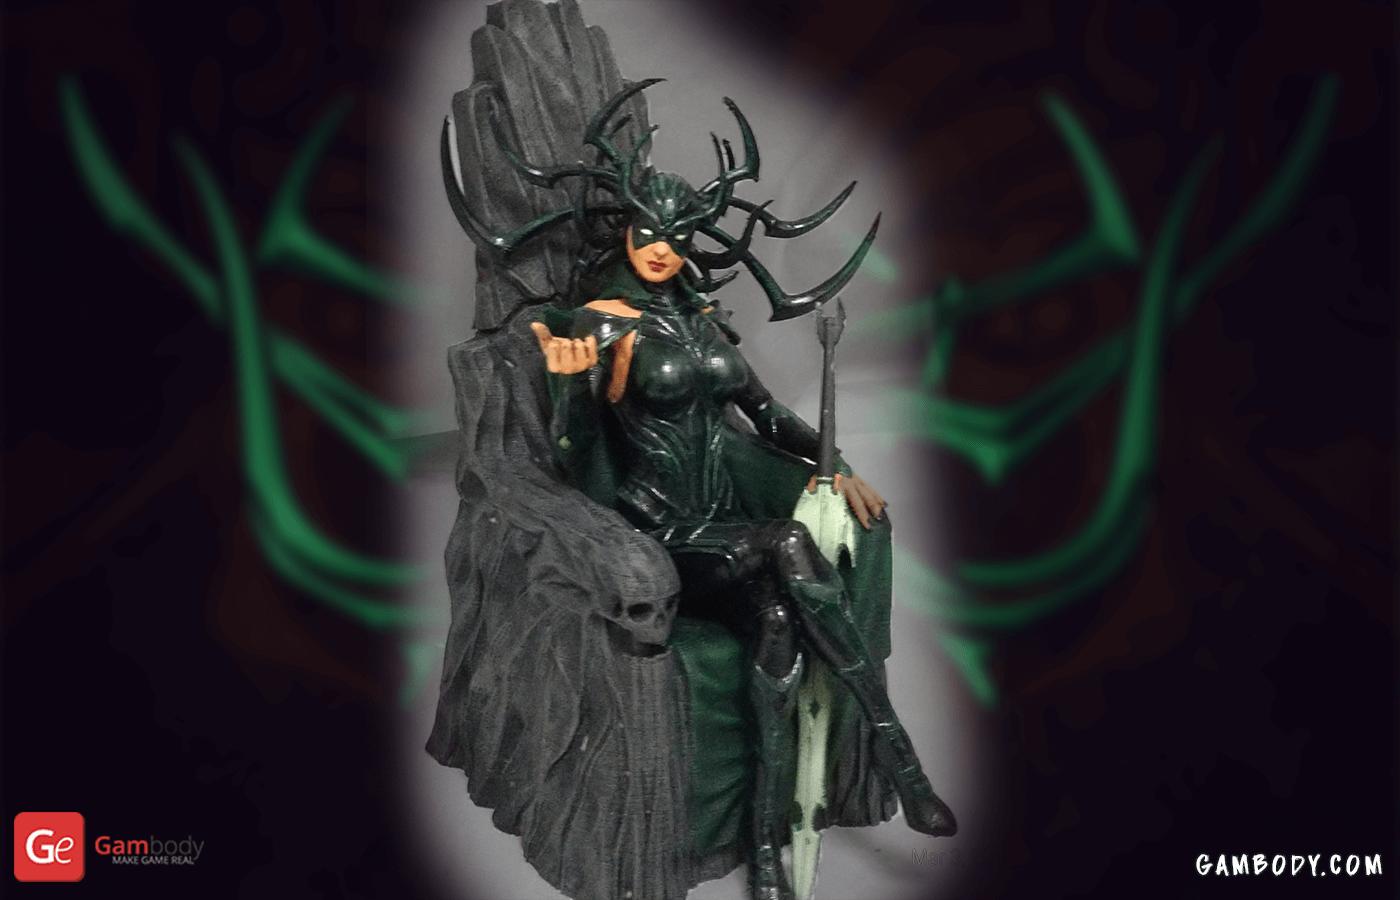 Hela on Throne 3D Printing Figurine